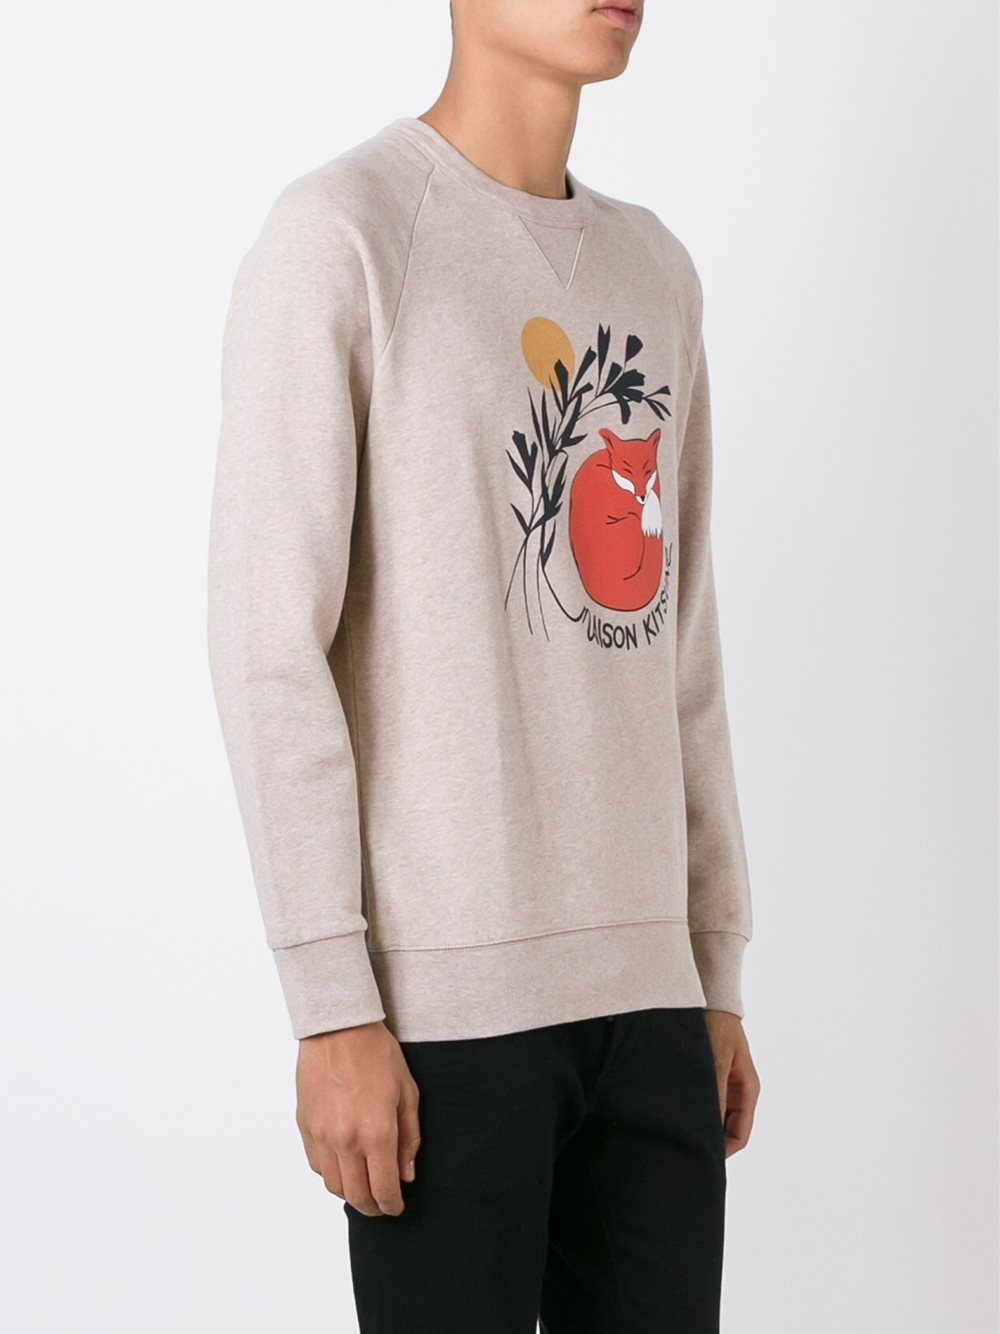 Maison Kitsun Maison Kitsun Sleeping Fox Print Sweater -5986